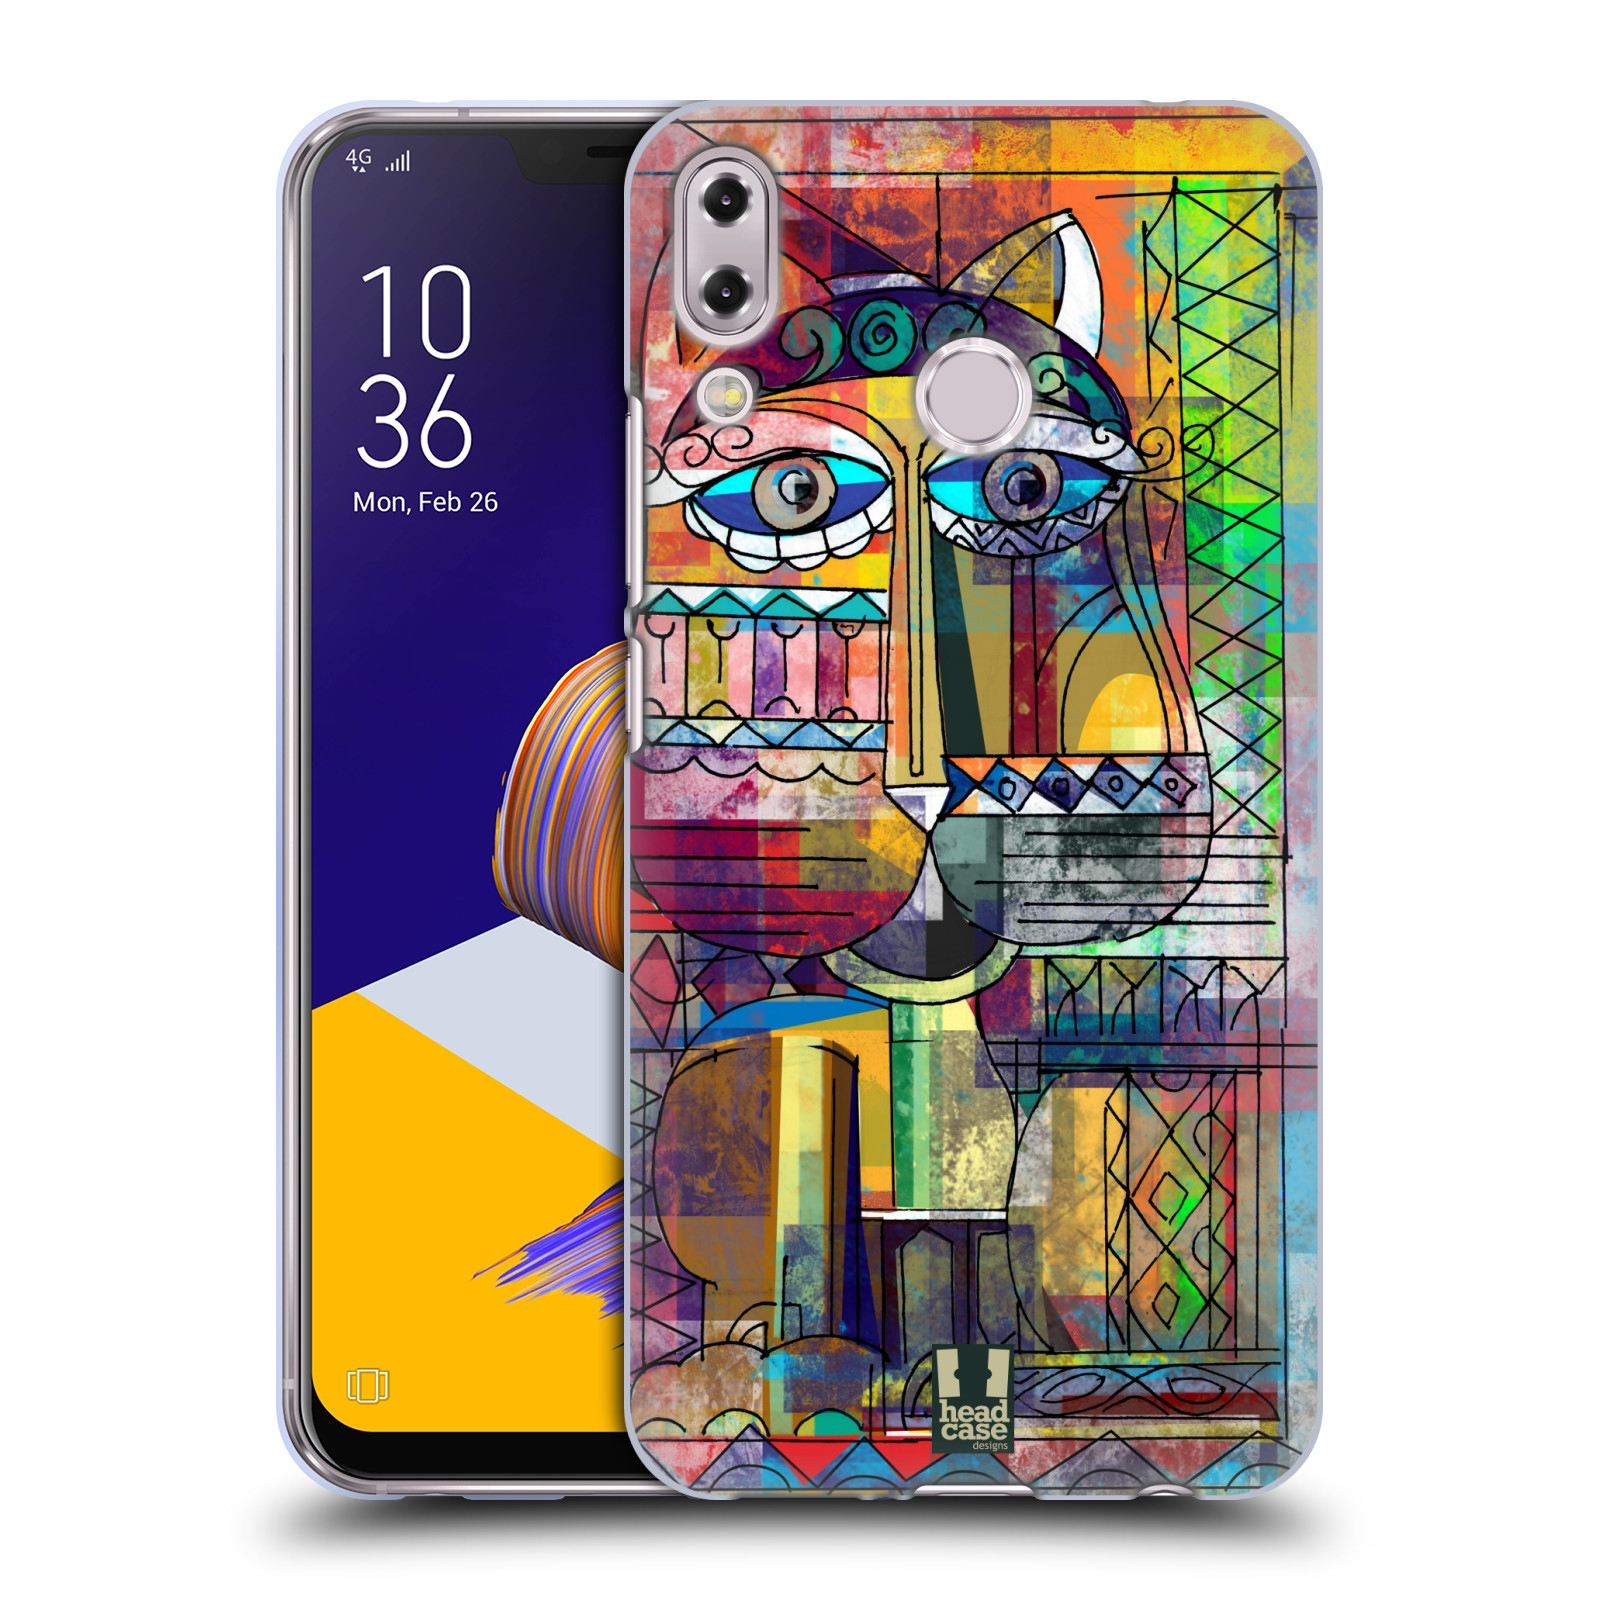 Silikonové pouzdro na mobil Asus Zenfone 5z ZS620KL - Head Case - AZTEC KORAT